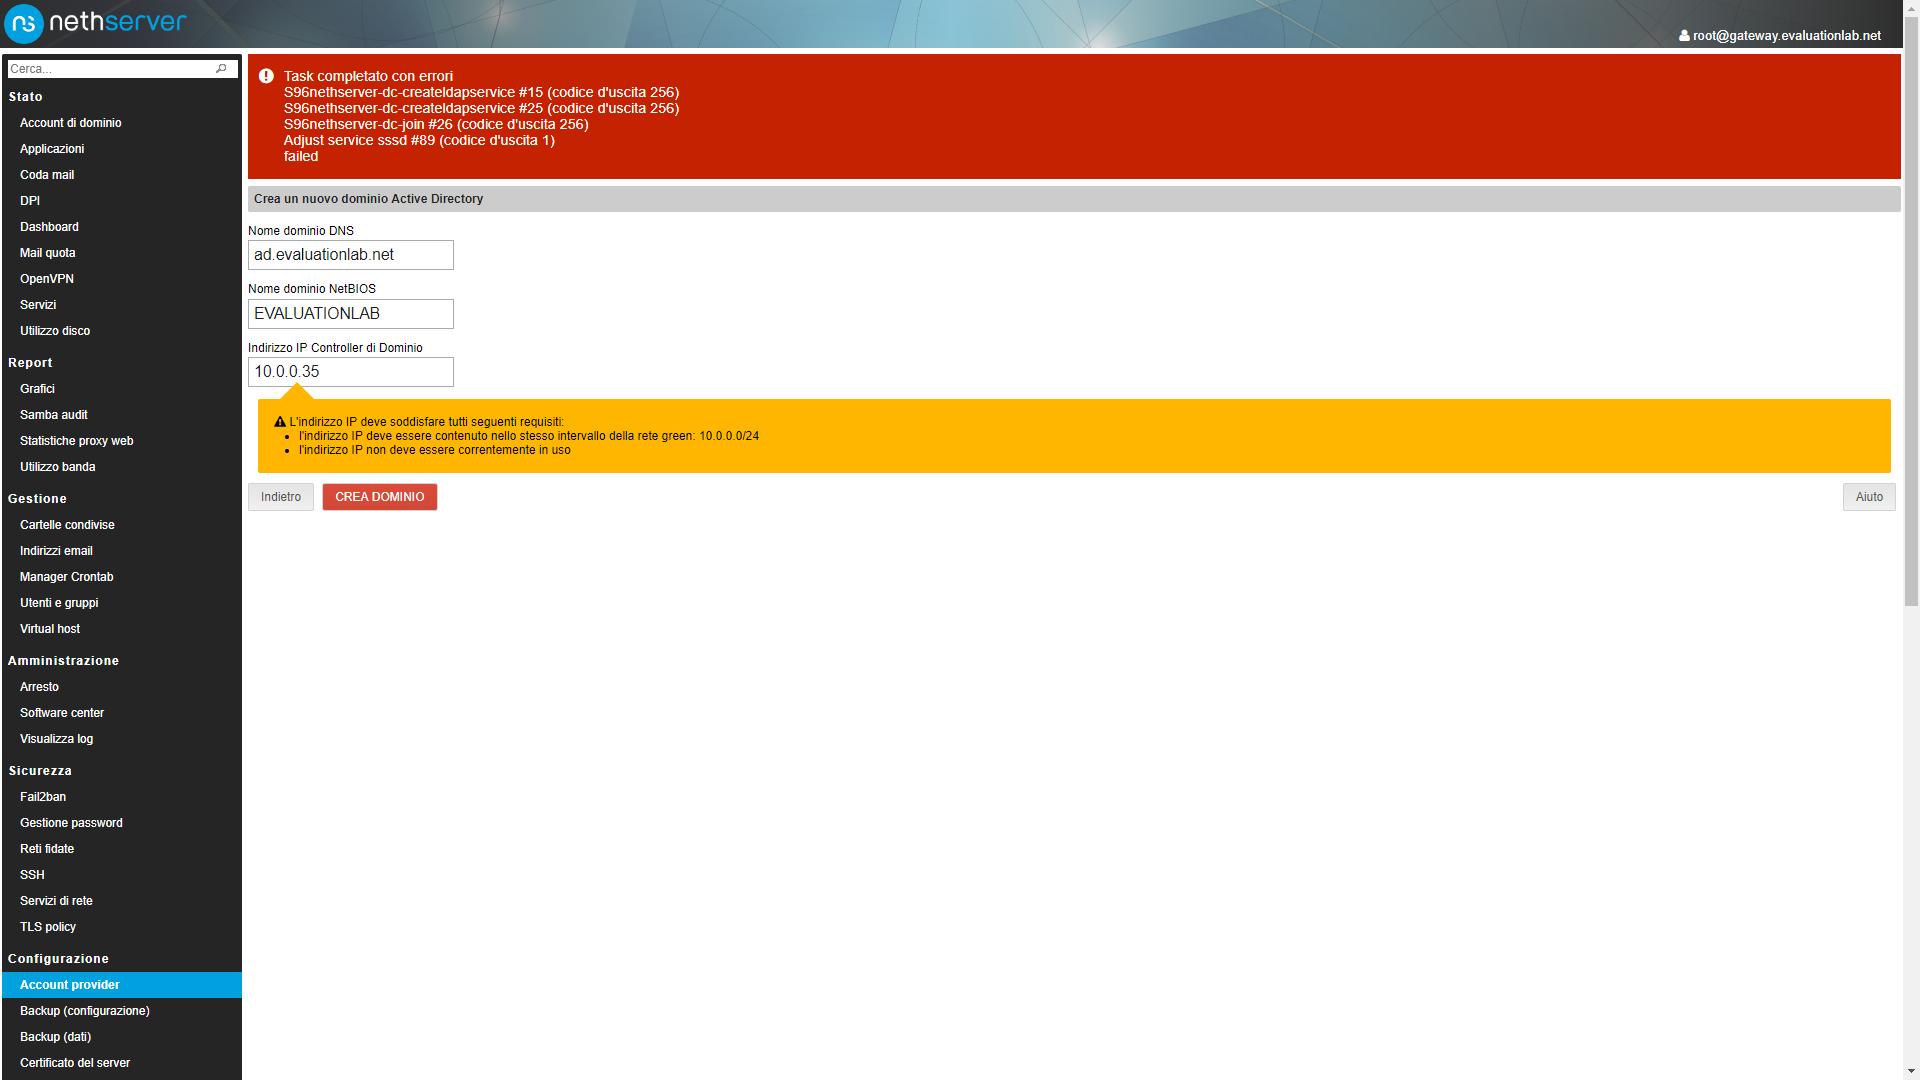 Change LDAP to AD Error - Support - NethServer Community